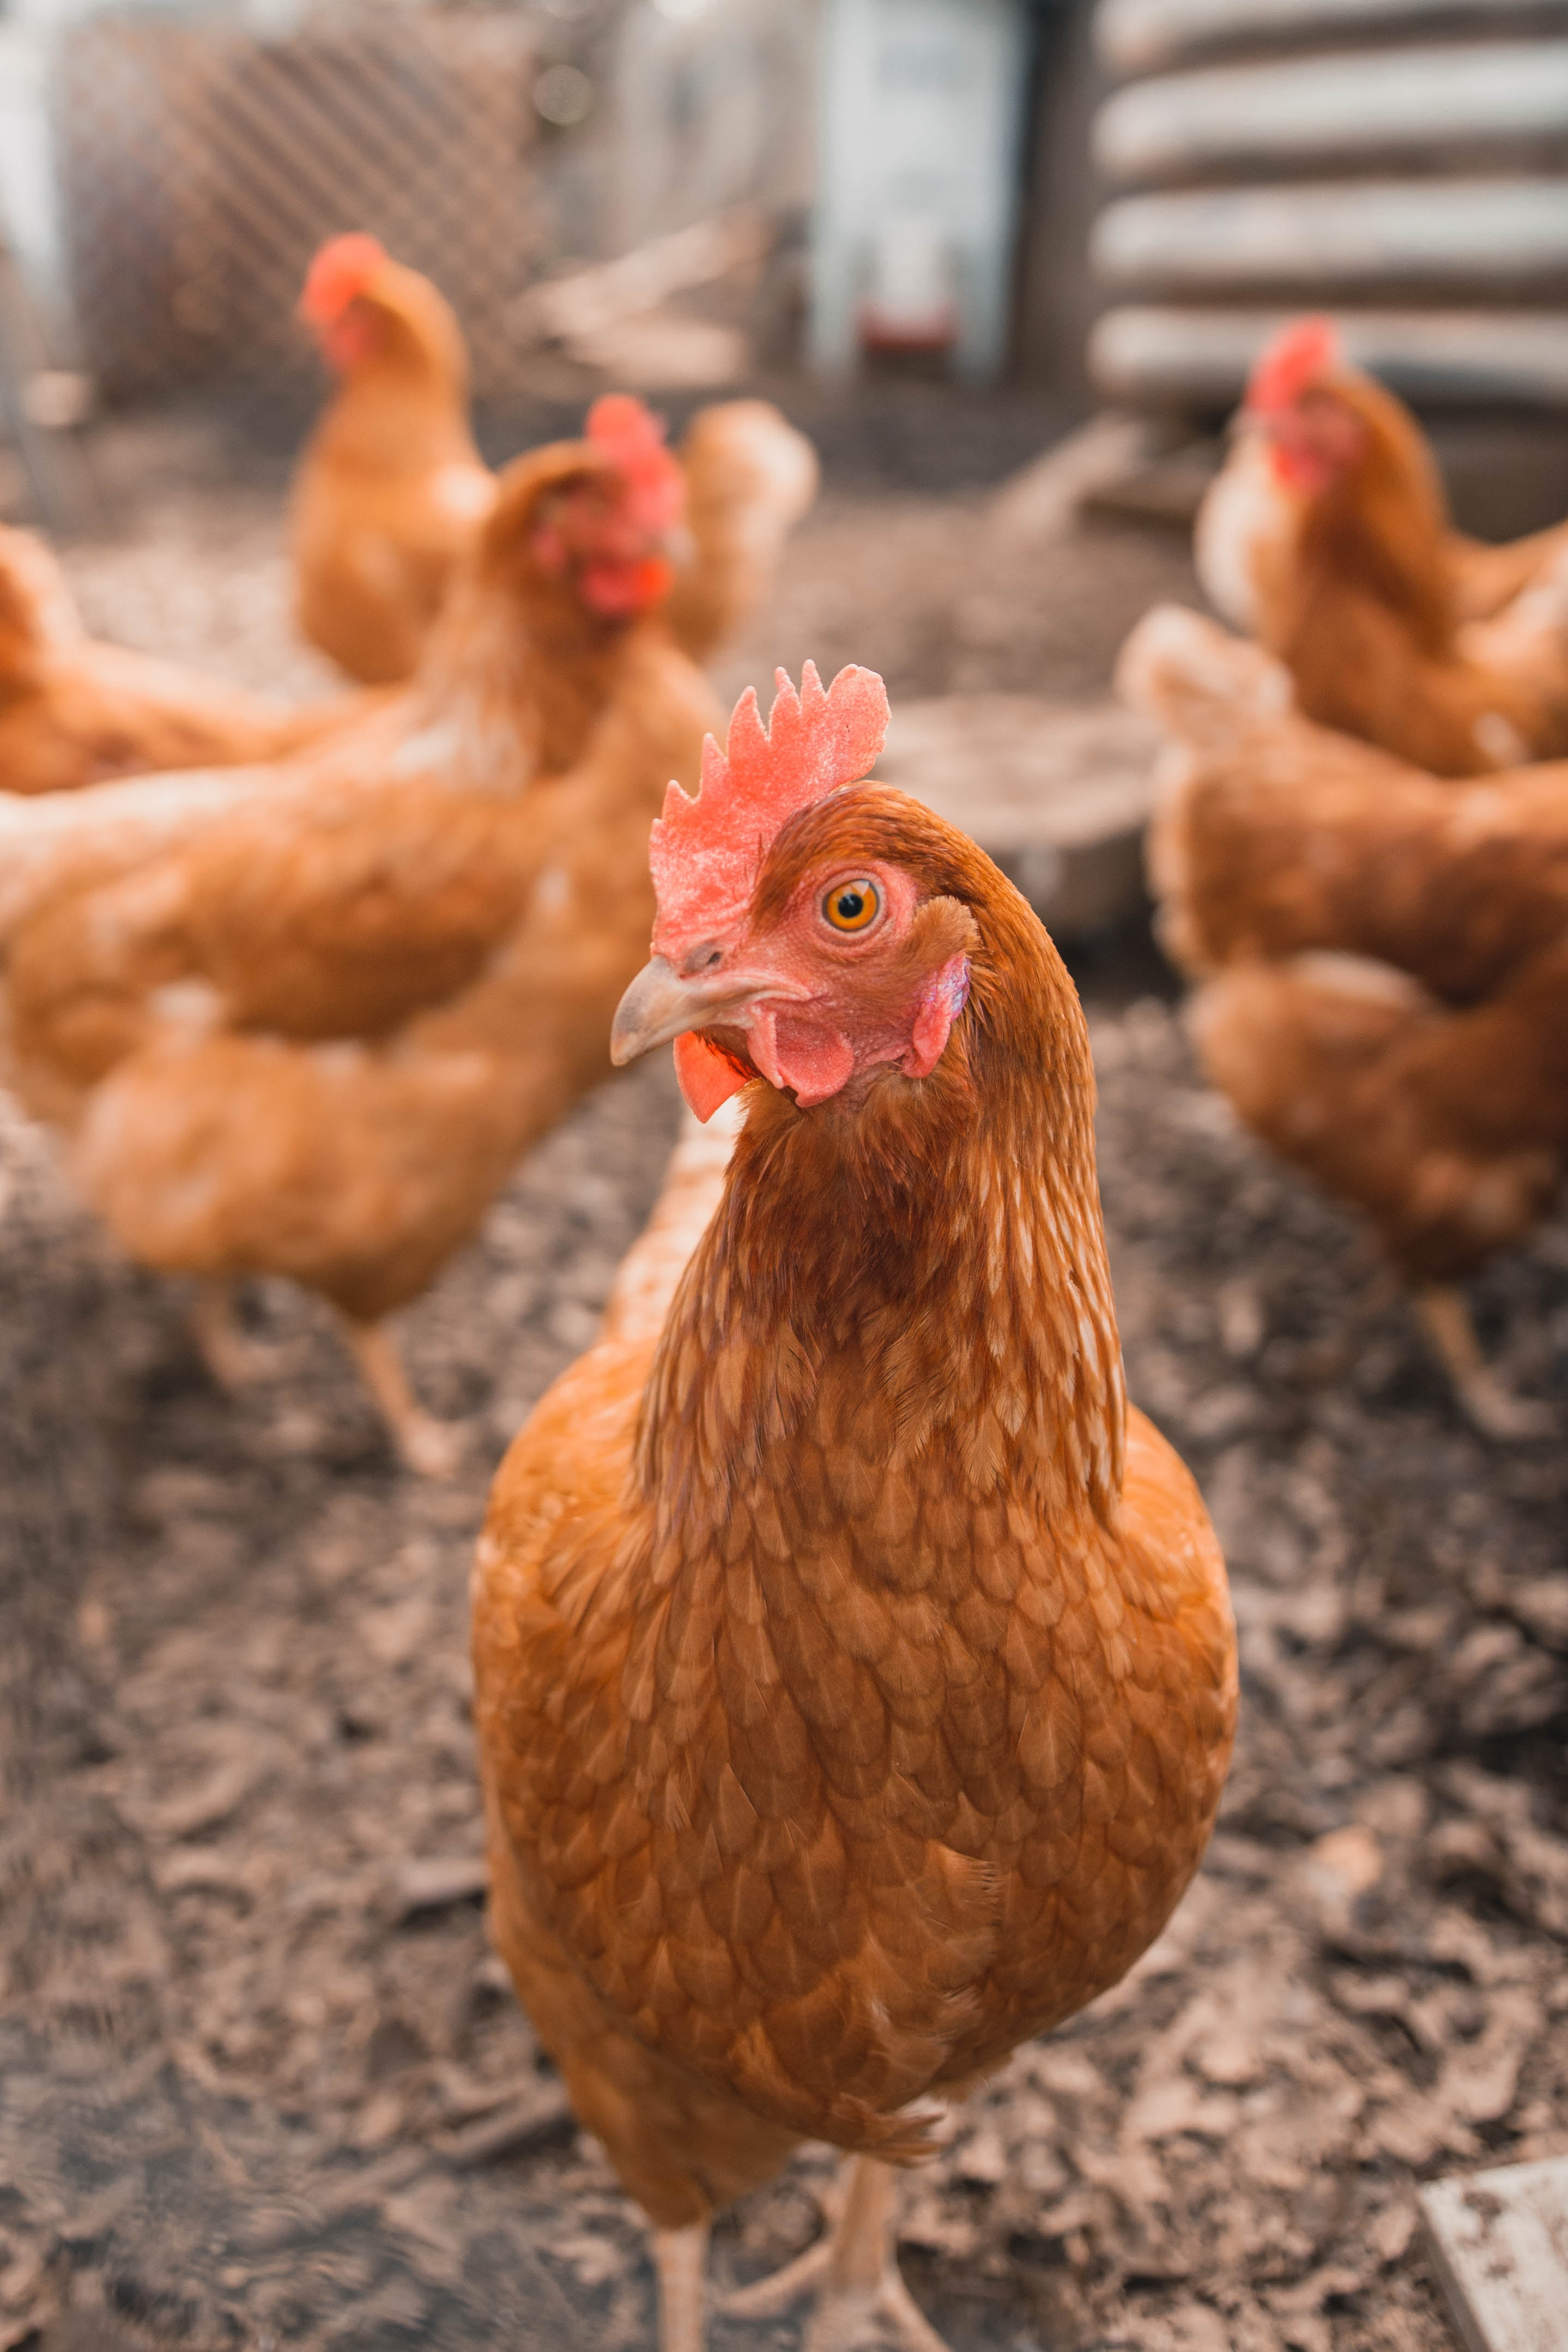 A free-range chicken on a farm